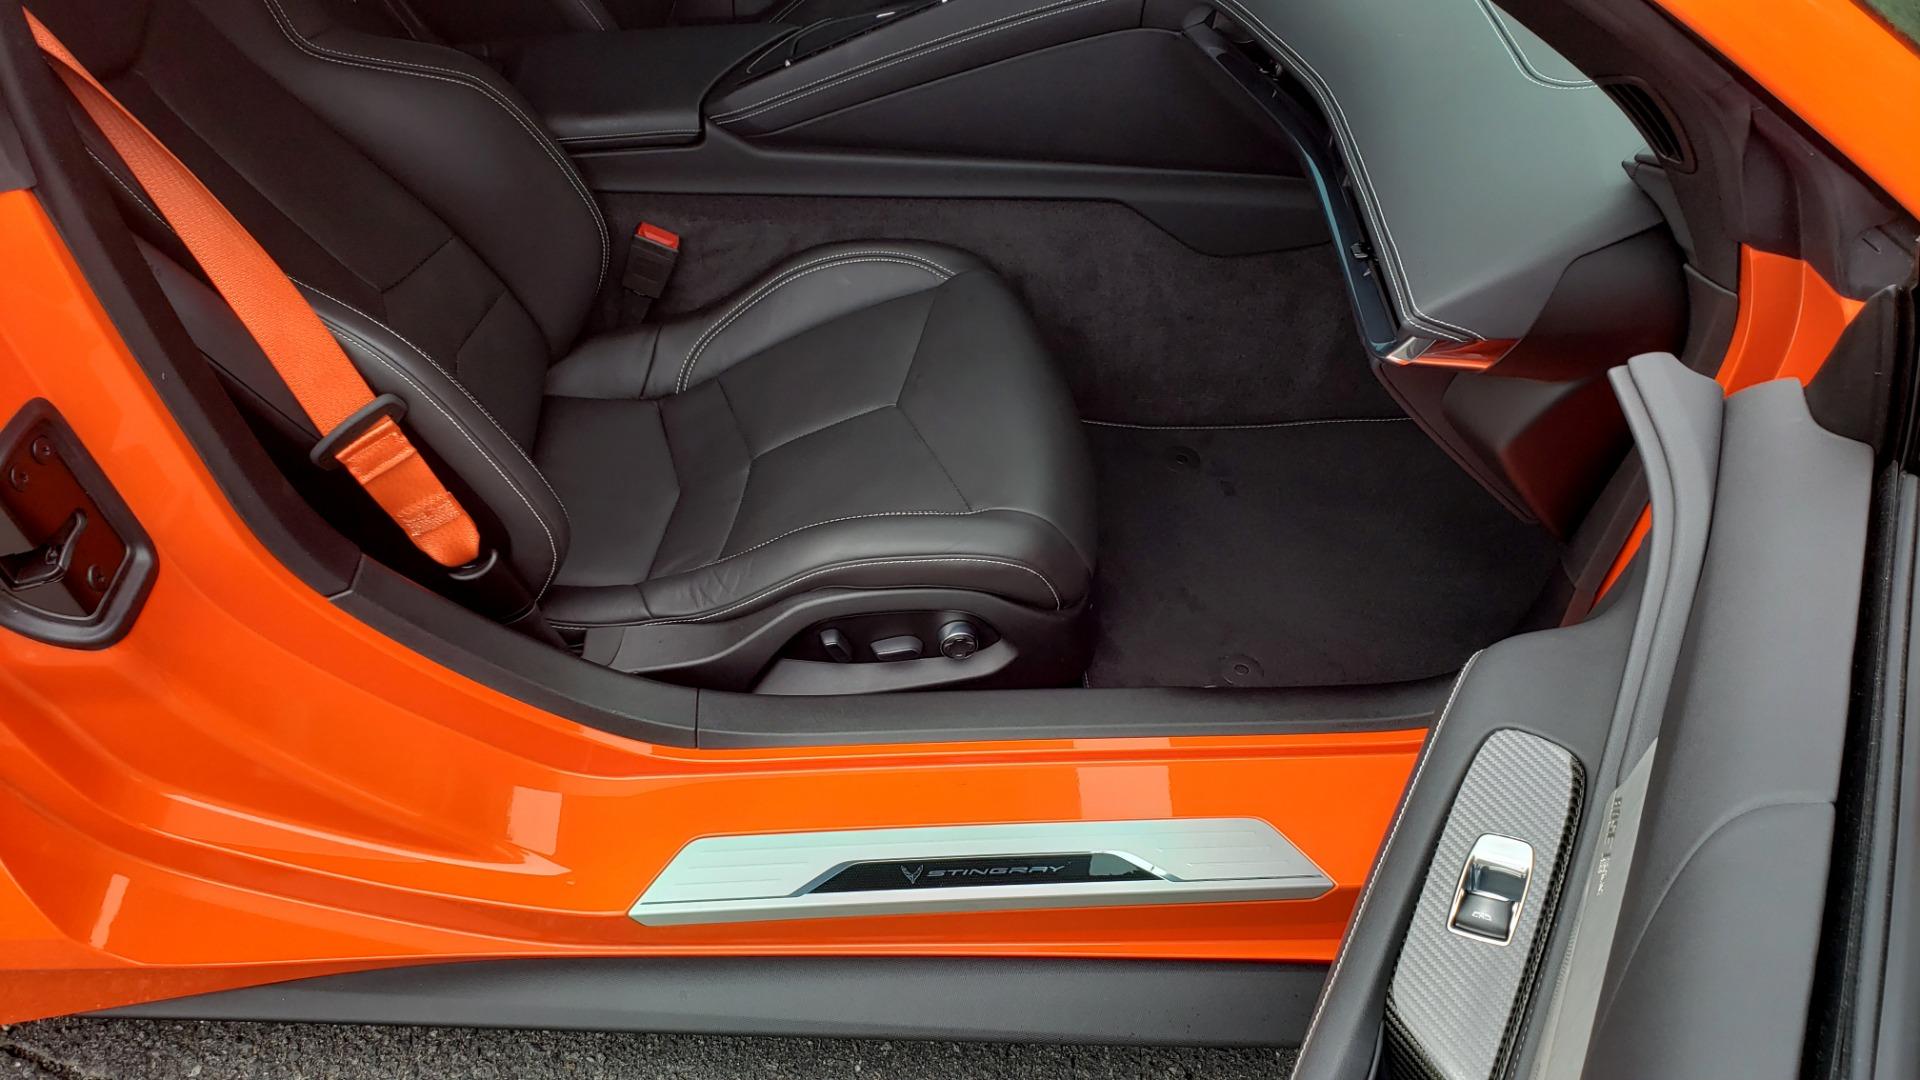 Used 2020 Chevrolet CORVETTE C8 STINGRAY 2LT / 6.2L V8 / 8-SPD AUTO / NAV / BOSE / REARVIEW / DATA RECOR for sale Sold at Formula Imports in Charlotte NC 28227 64